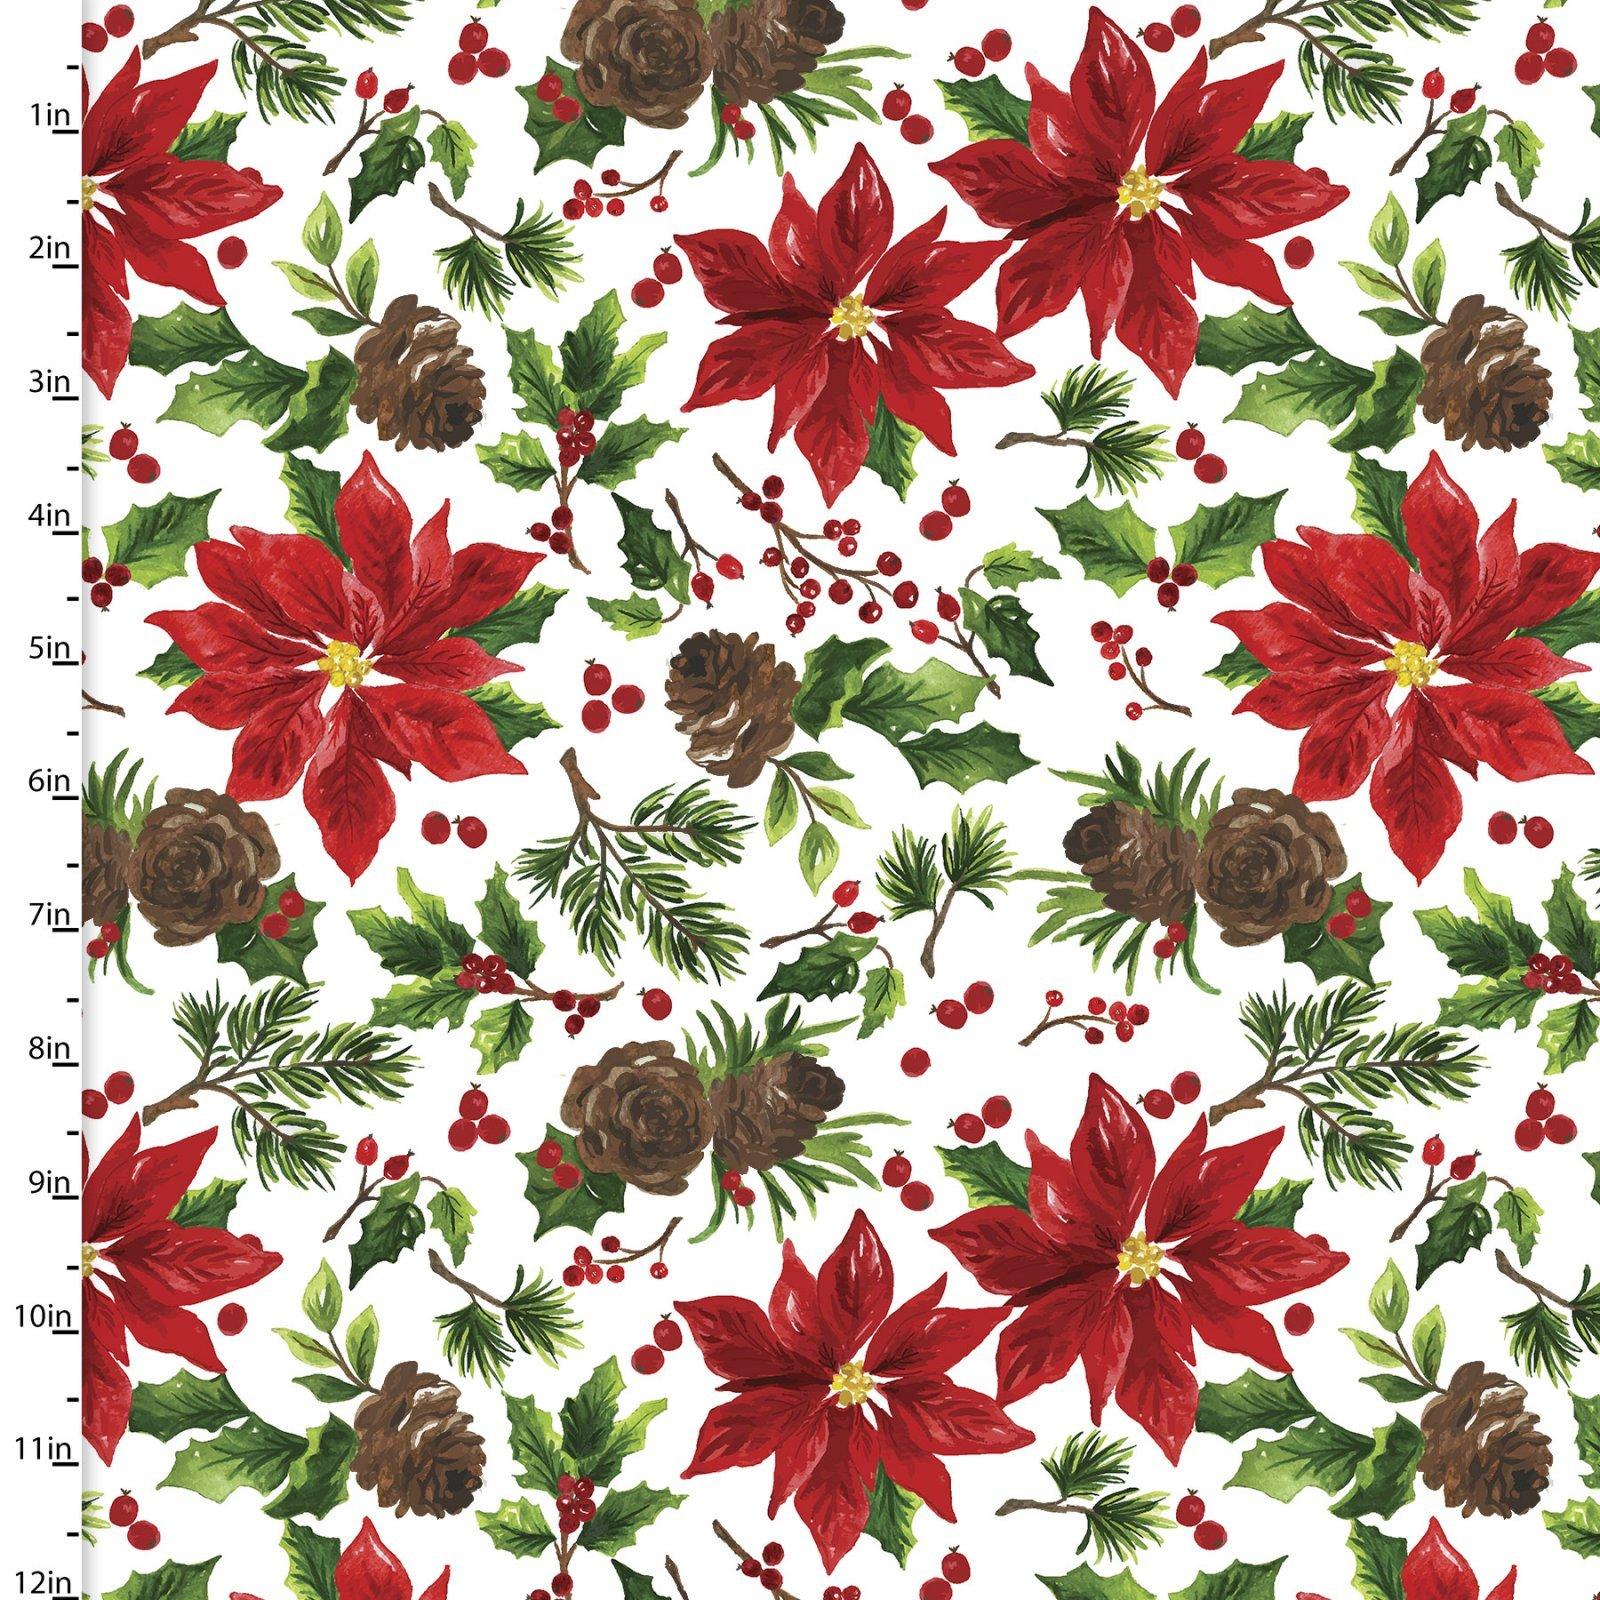 Christmas Floral 15131 Poinsettias